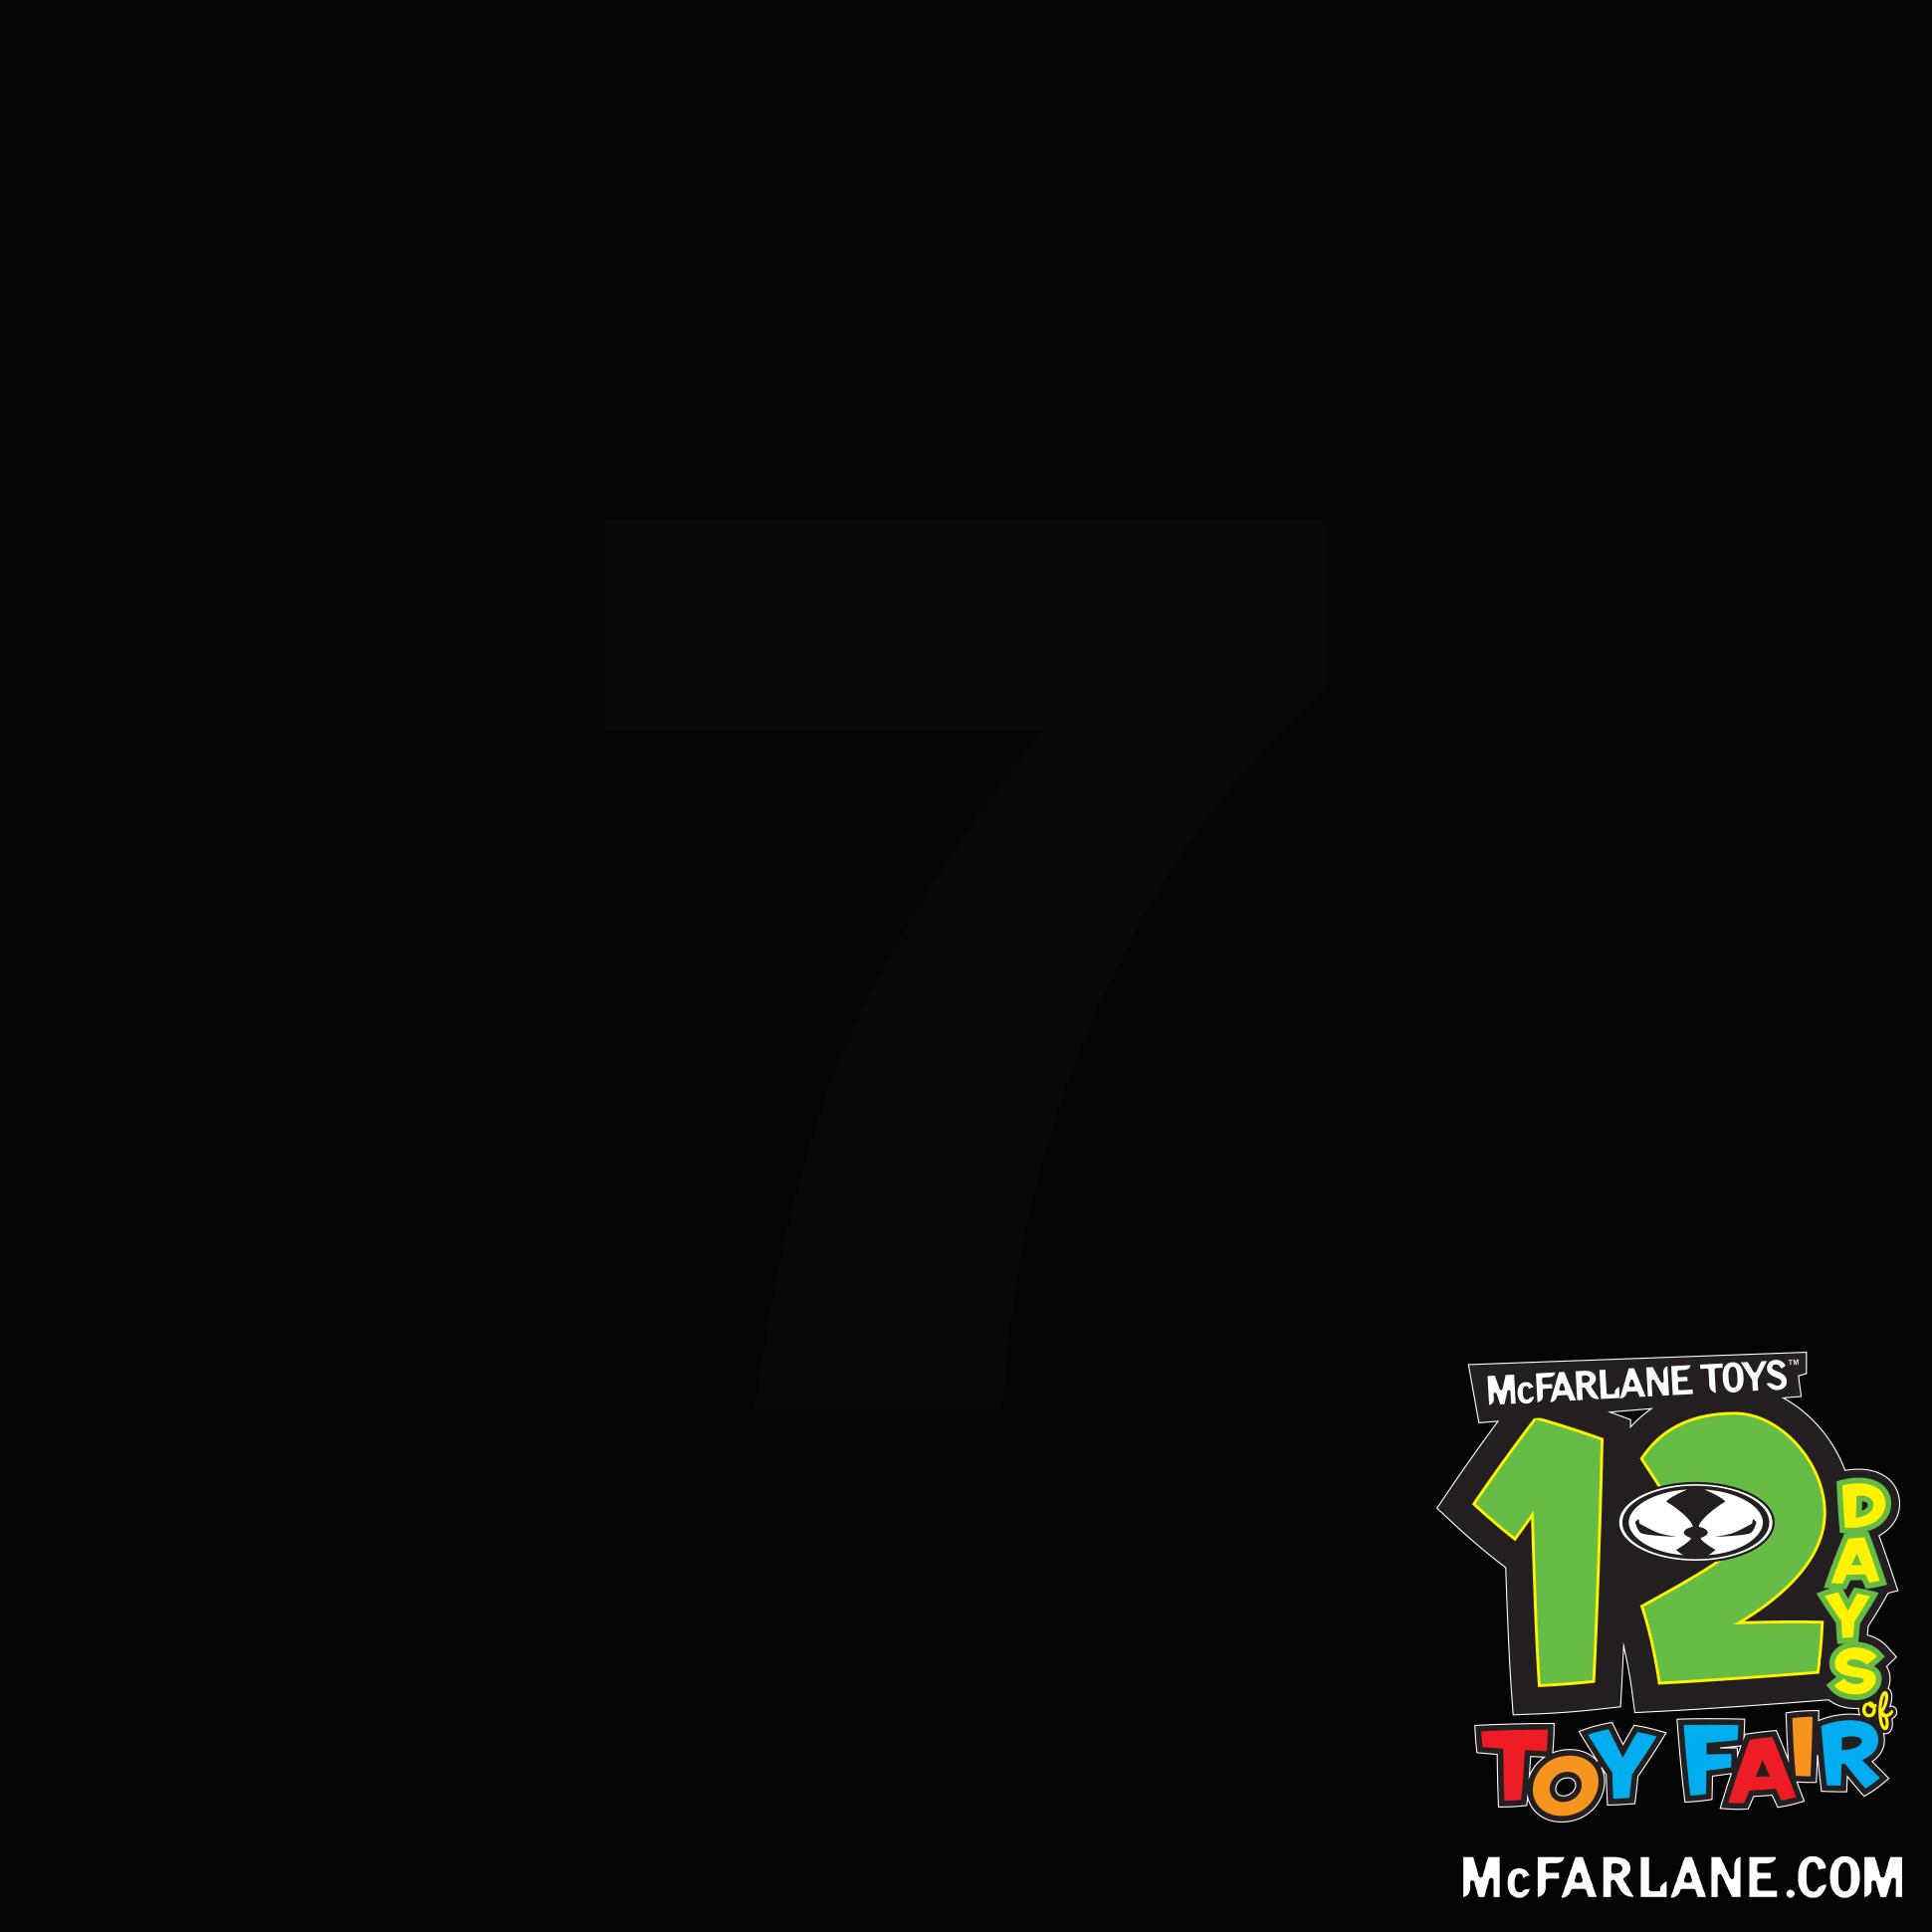 nytf-12-day-teaser